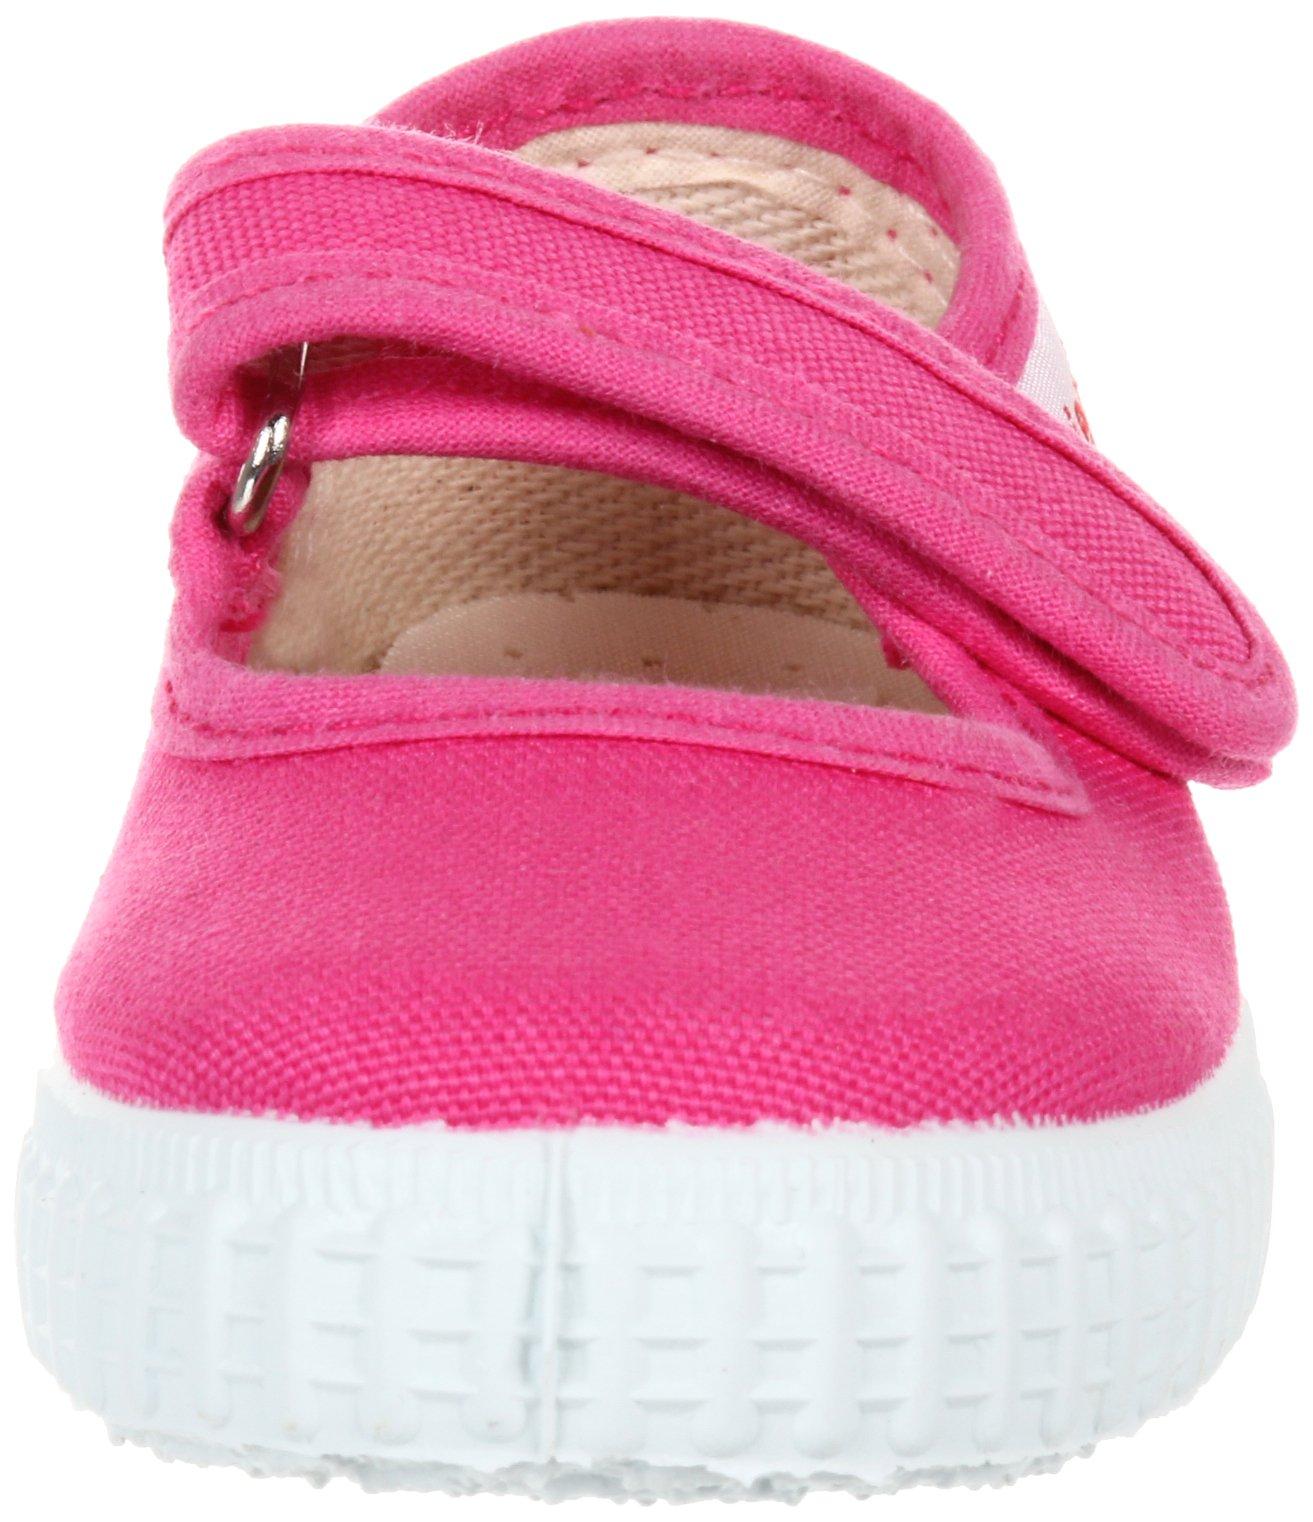 Cienta Girls Mary Jane Shoe, Fuchsia, 19 M EU / 3.5 M US Toddler by Cienta (Image #4)